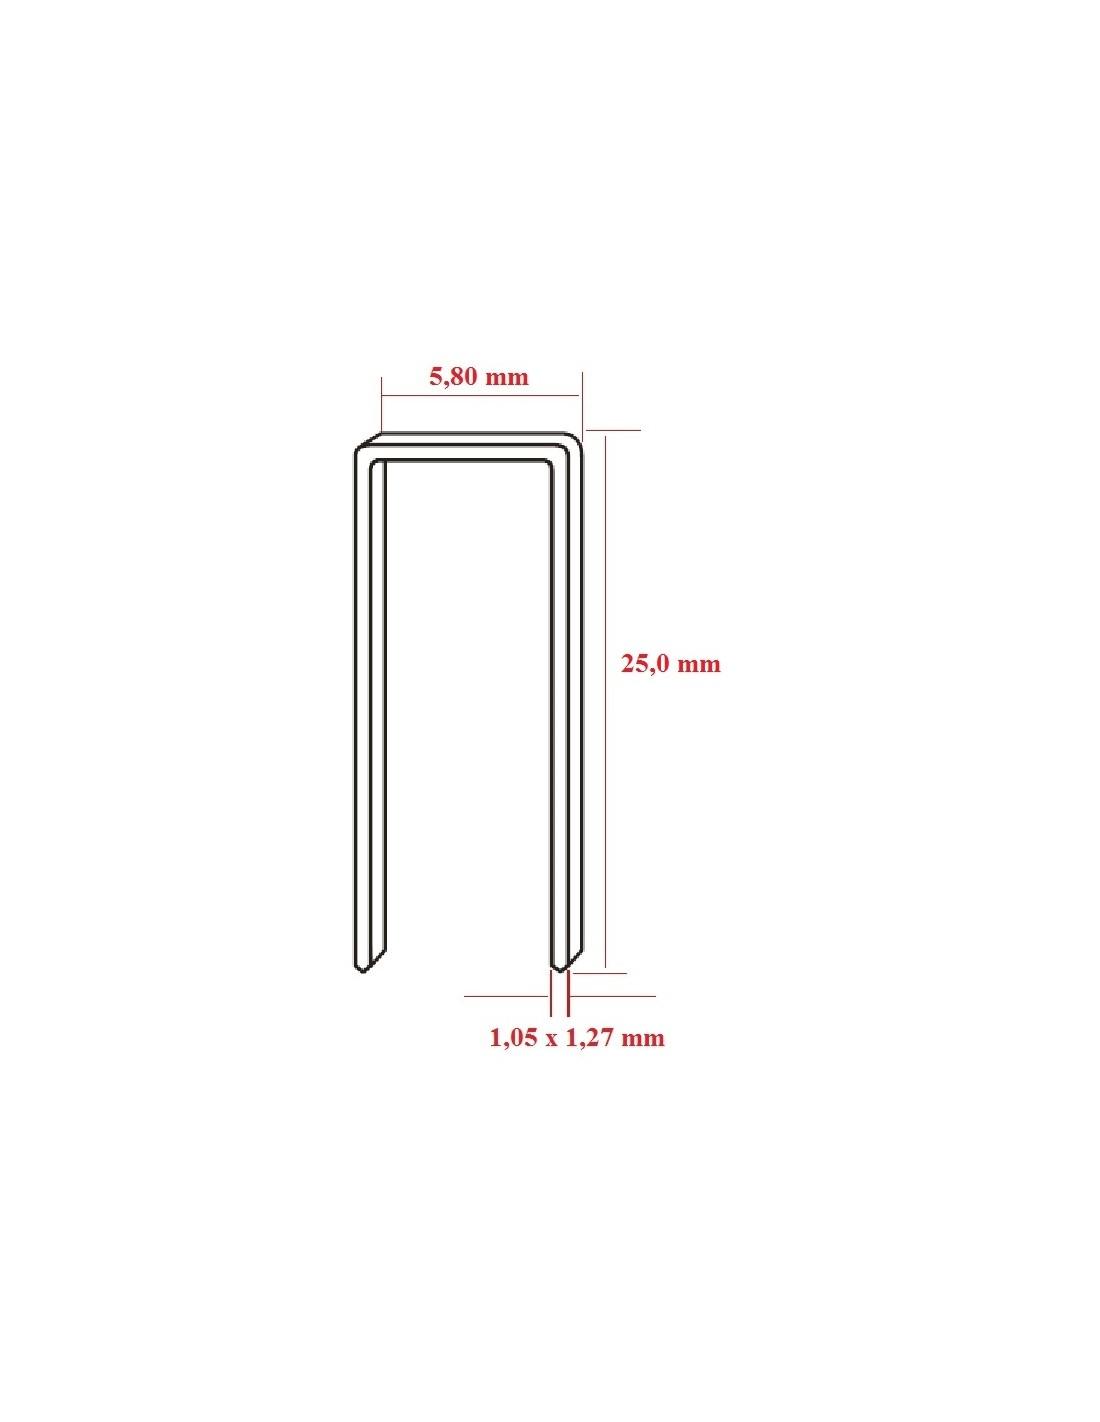 Capse tip U 90 cu lungimea de 25,0 mm - dimensiuni